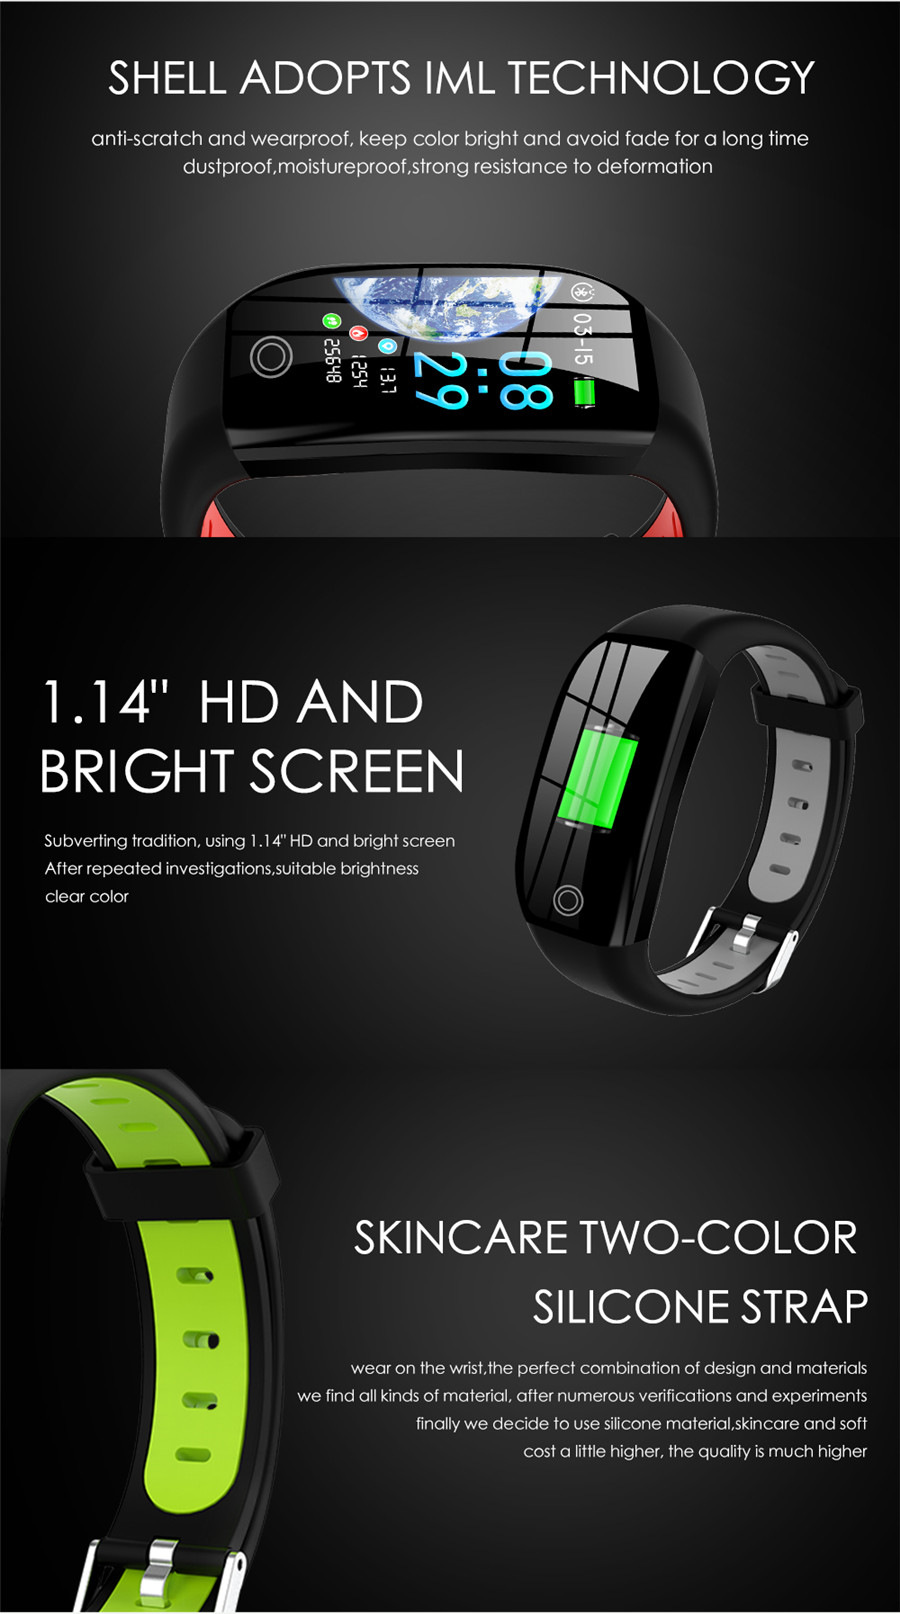 HTB1Fi4ZeL1H3KVjSZFHq6zKppXaY F21 Smart Bracelet GPS Distance Fitness Activity Tracker IP68 Waterproof Blood Pressure Watch Sleep Monitor Smart Band Wristband